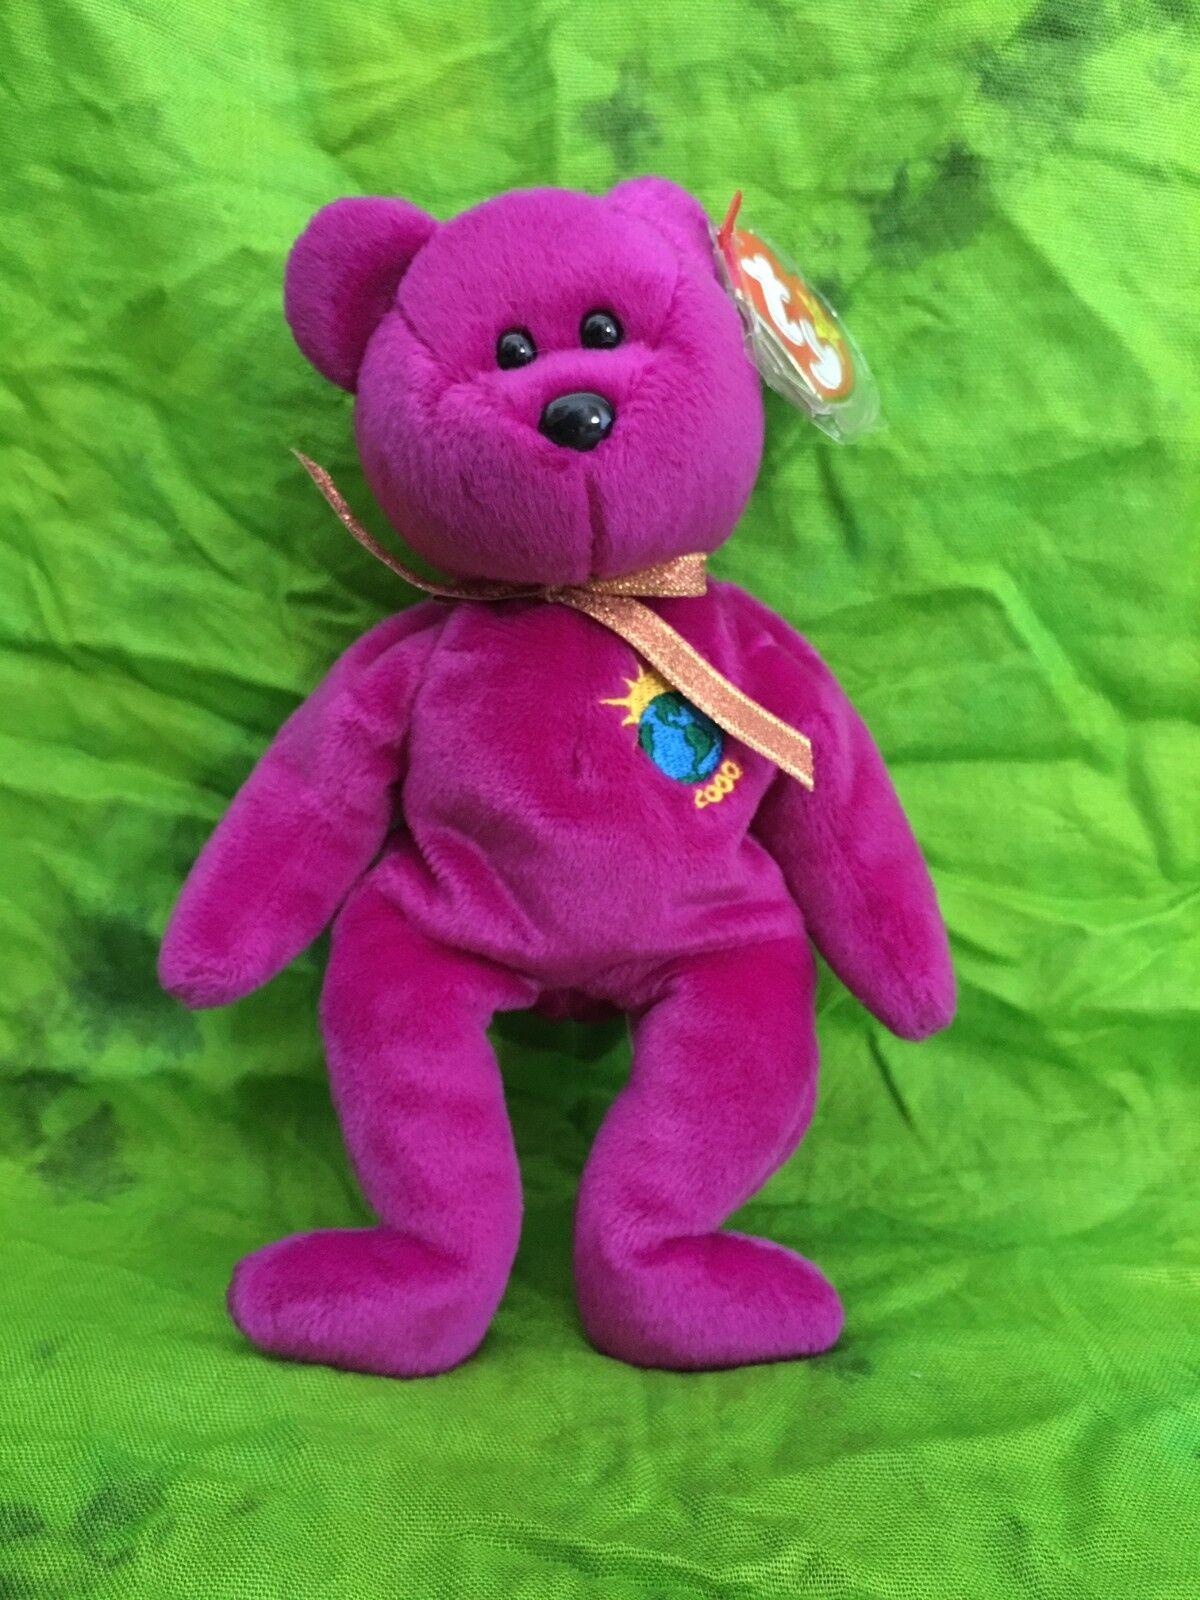 Millenium Bear  with tag errors  RARE – TY Beanie Baby – version 1 Millennium